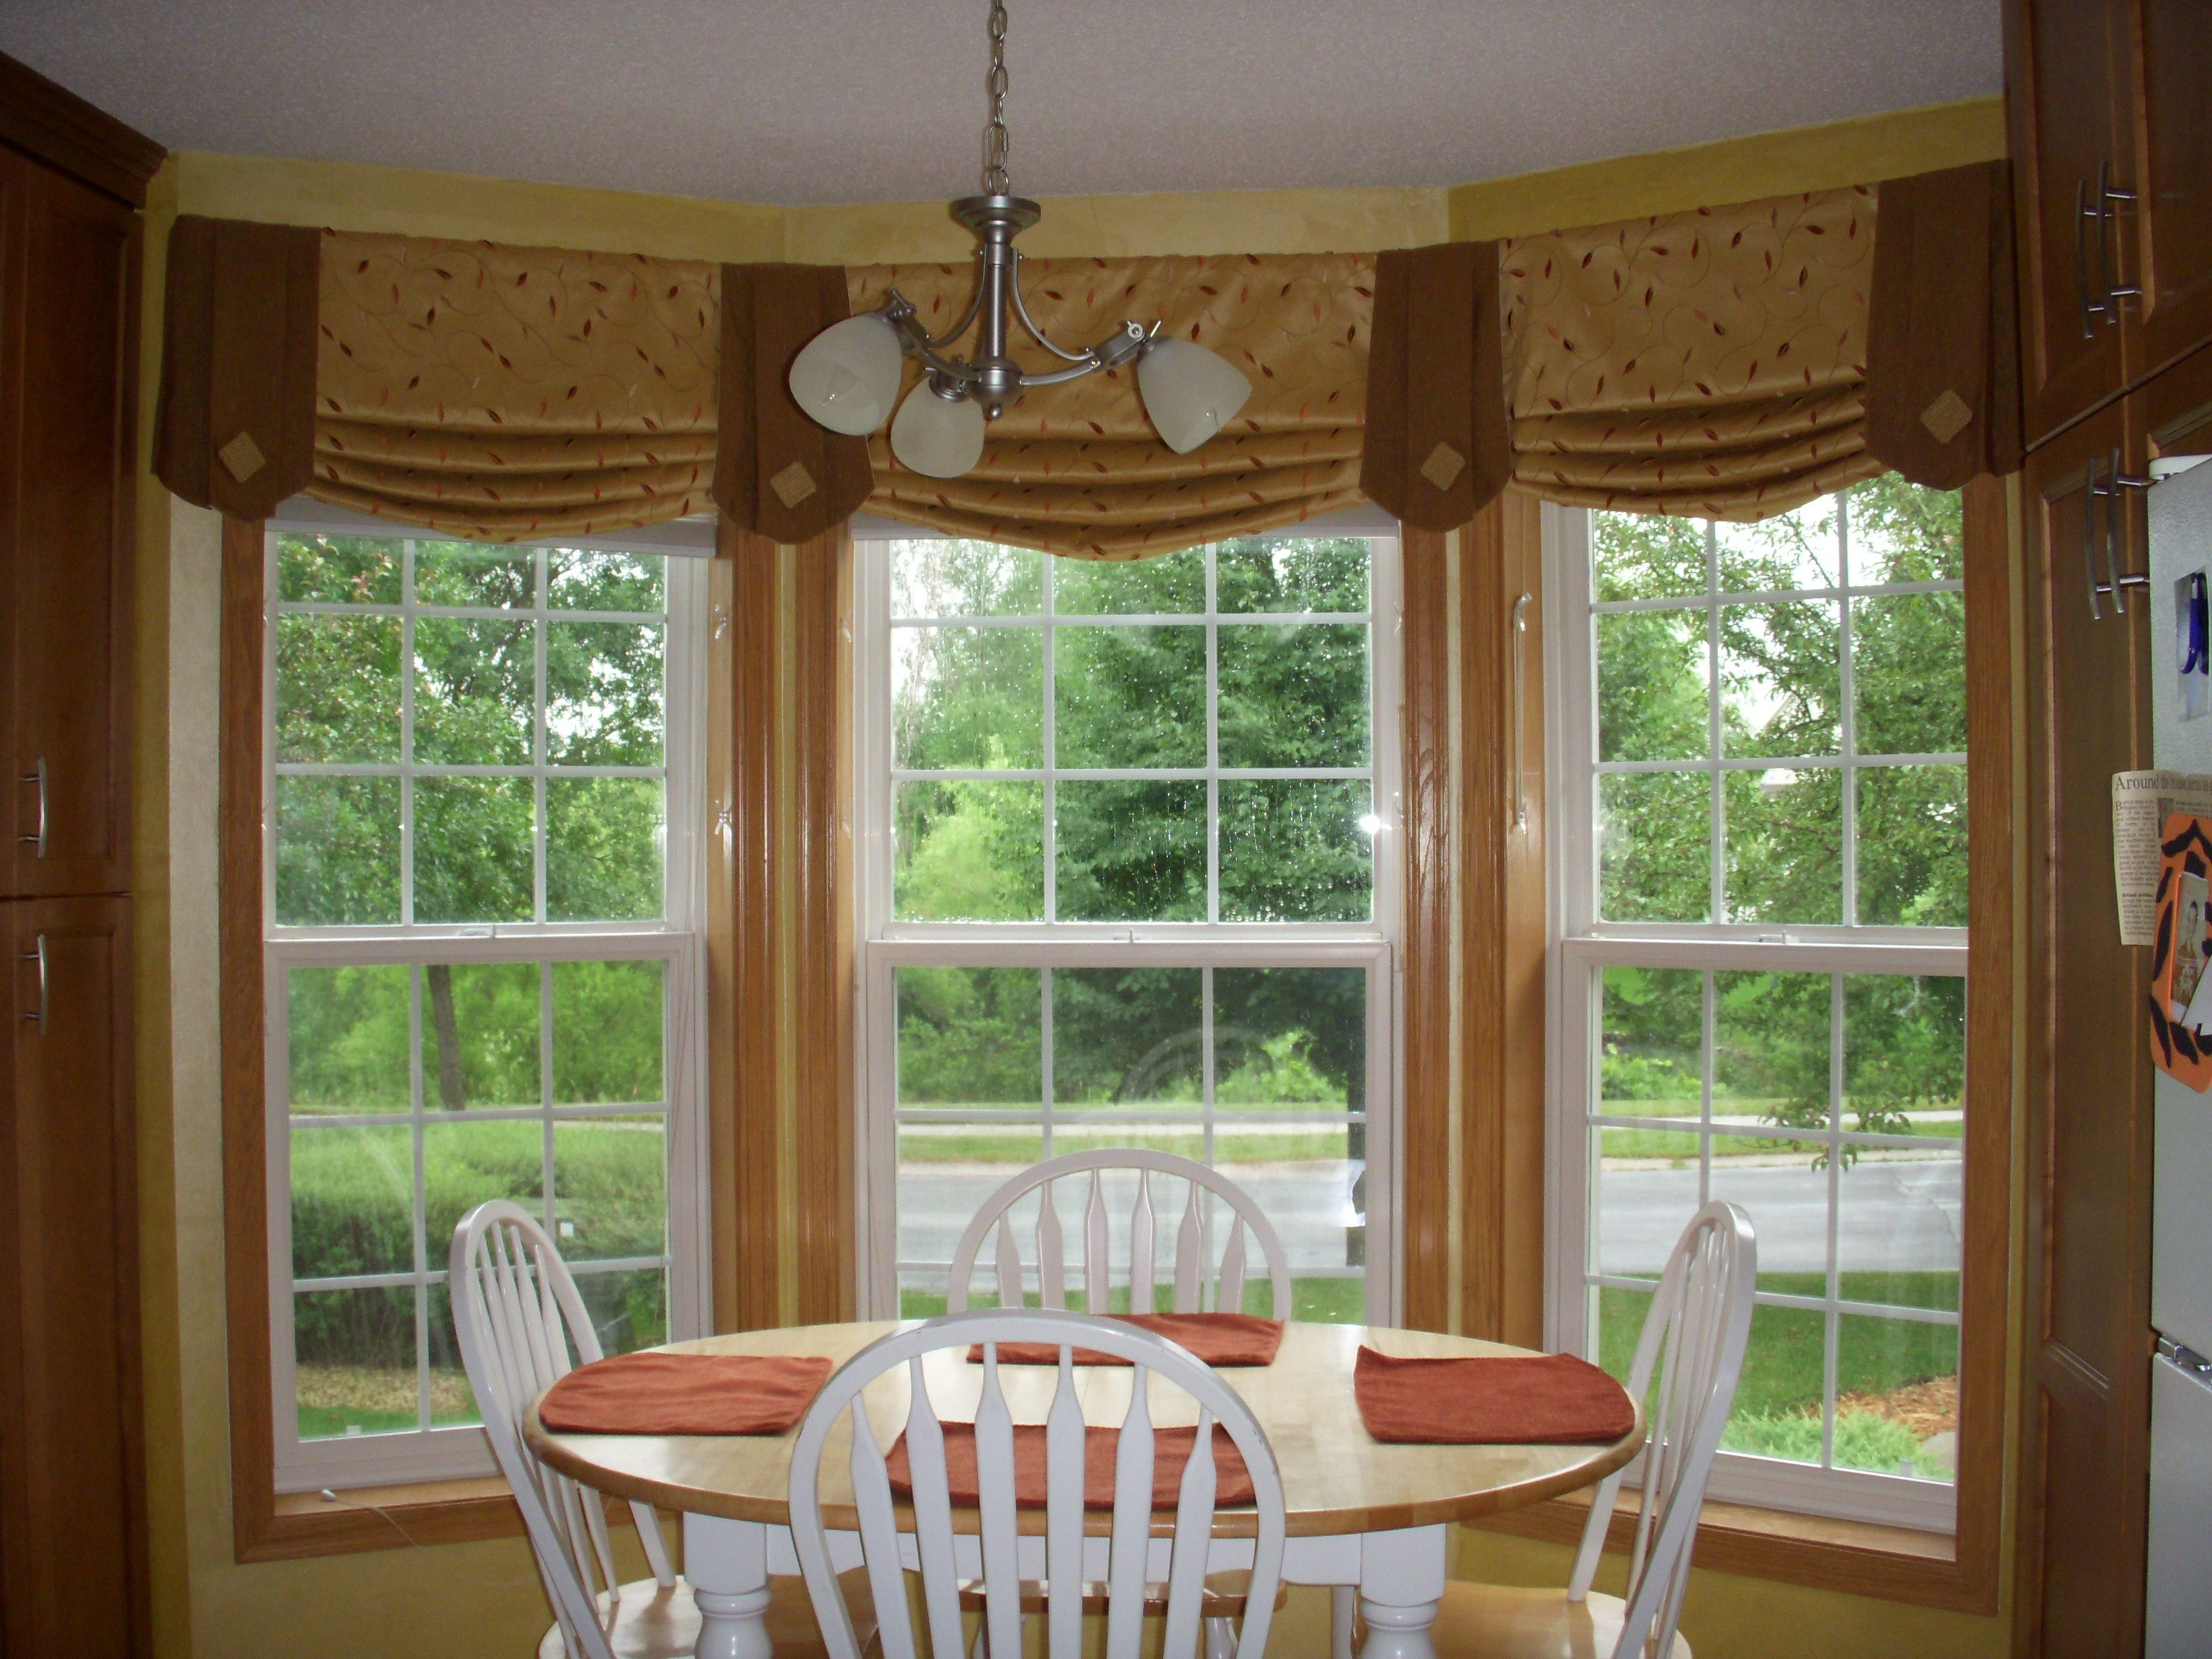 Http Moyuc Com Images 2013 10 Bay Window Treatments 3072x2304 Covering Bay Windows No Problem Bay Window Curtains Curtains Living Room Bay Window Treatments